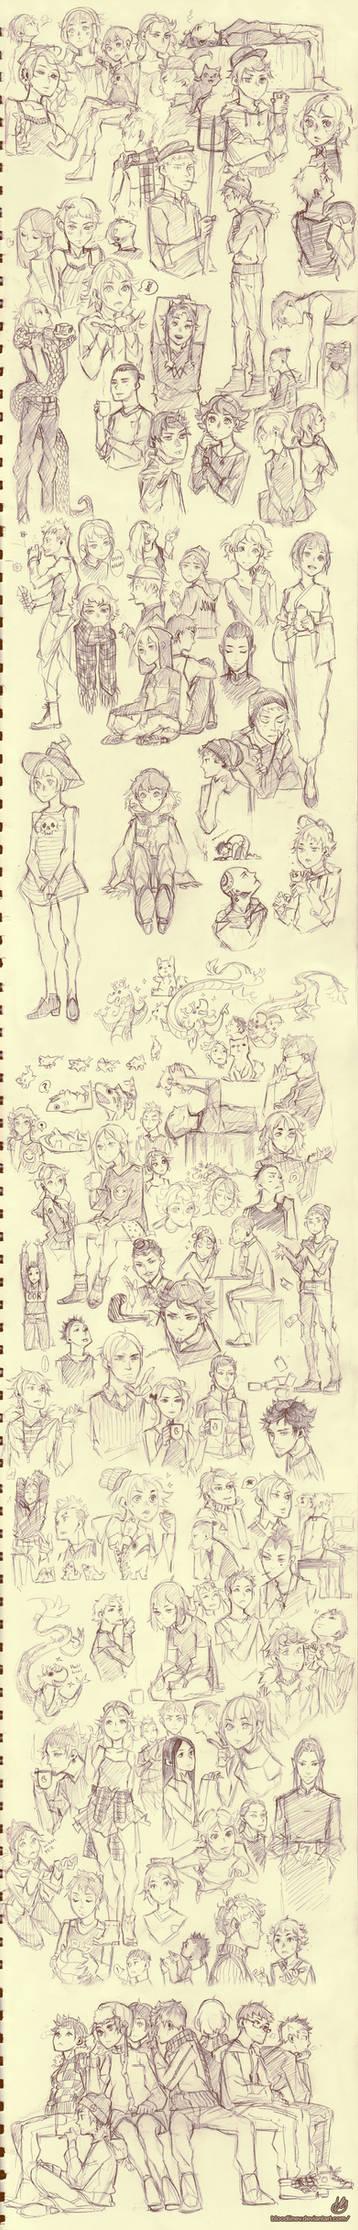 fifty shades of sketchdump